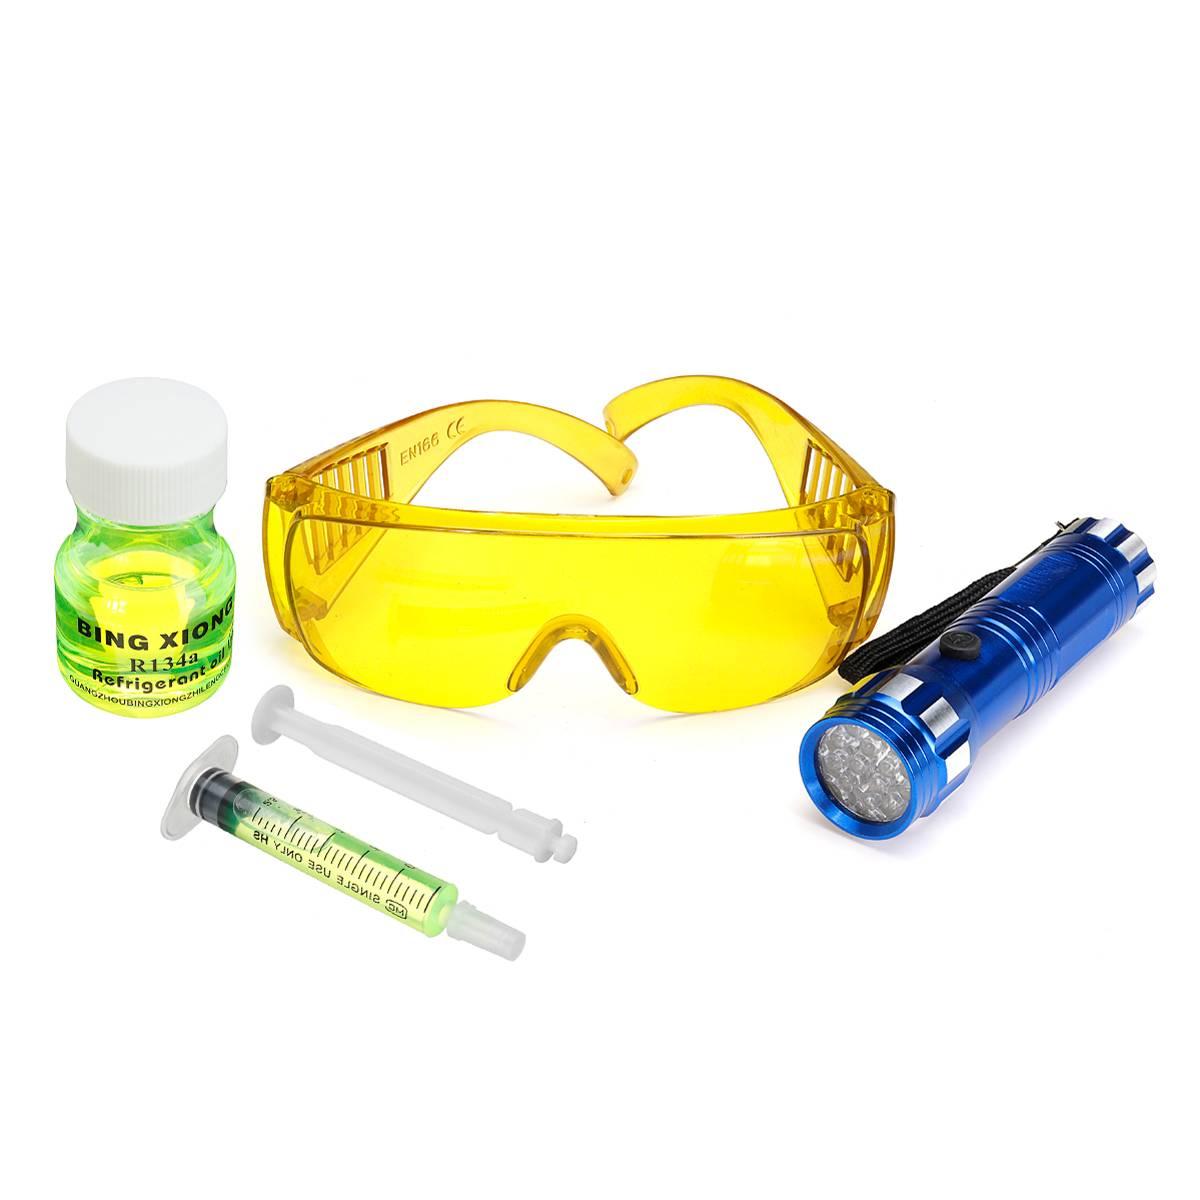 Car Air Conditioning A/C System Leak Test Detector Leakage Detecting Tool Kit 28 LED UV Flashlight UV Dye Fluorescent Glasses